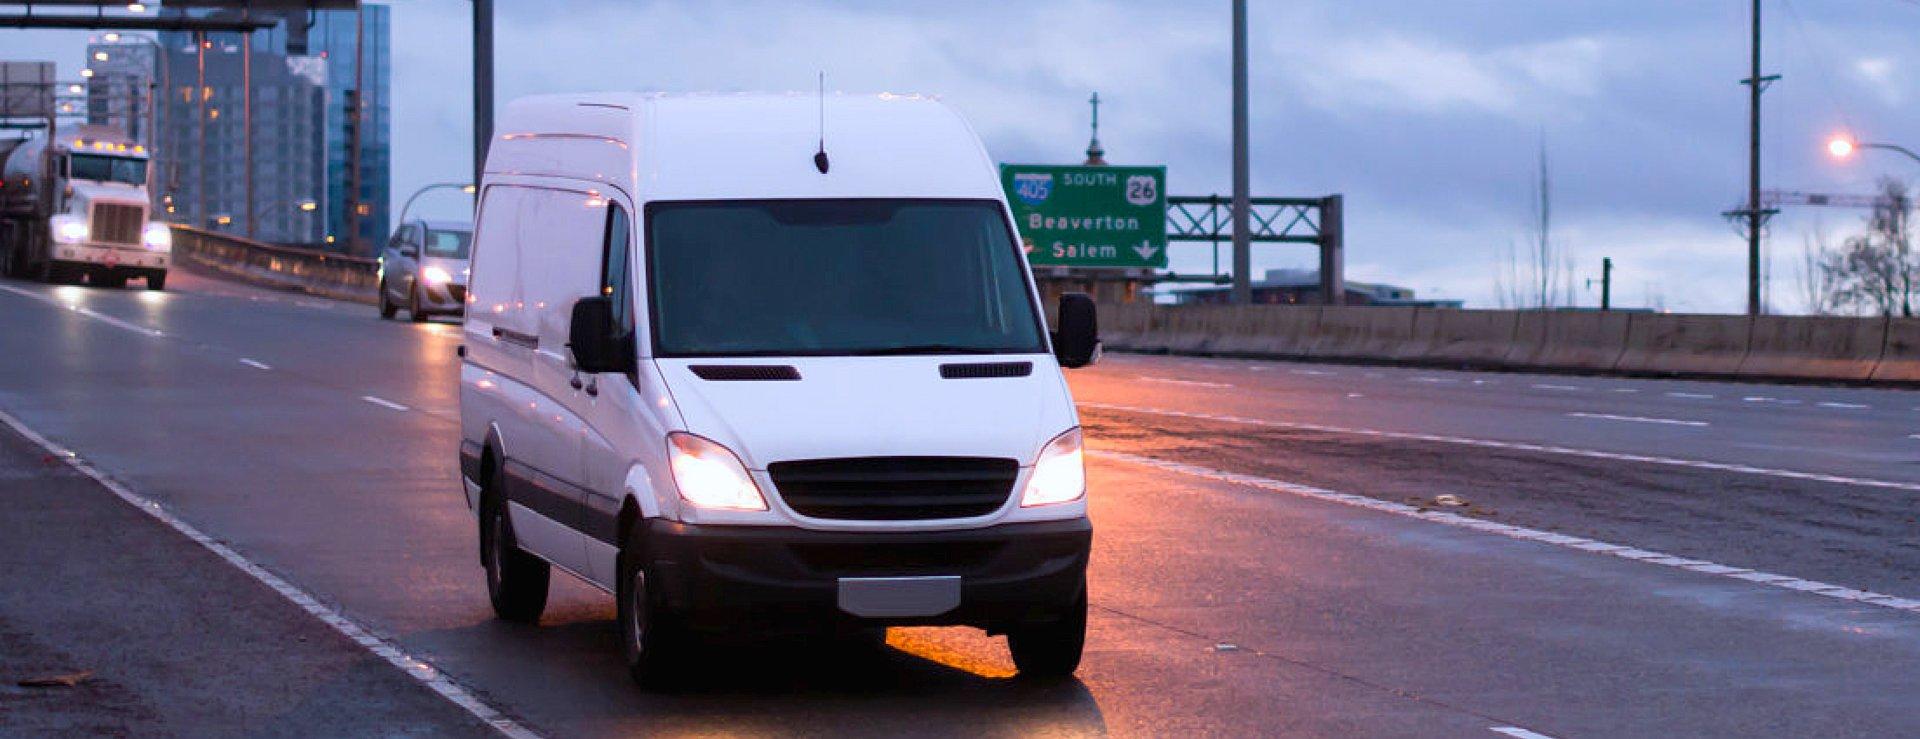 Expediting and Logistics in Dayton, Ohio